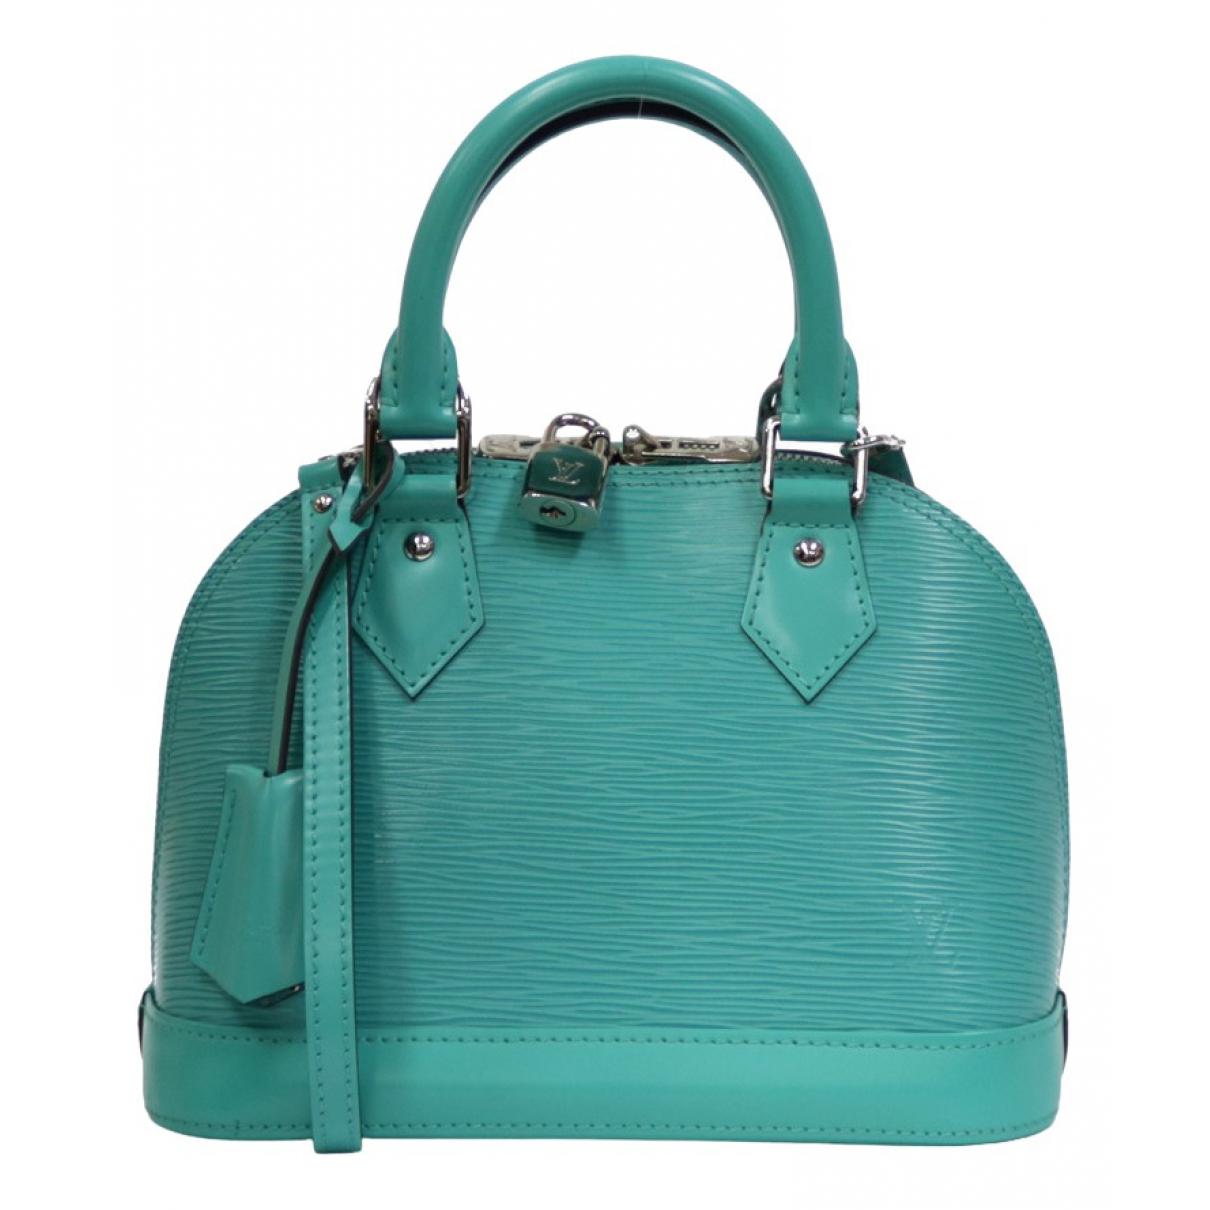 Louis Vuitton - Sac a main Alma BB pour femme en cuir - turquoise